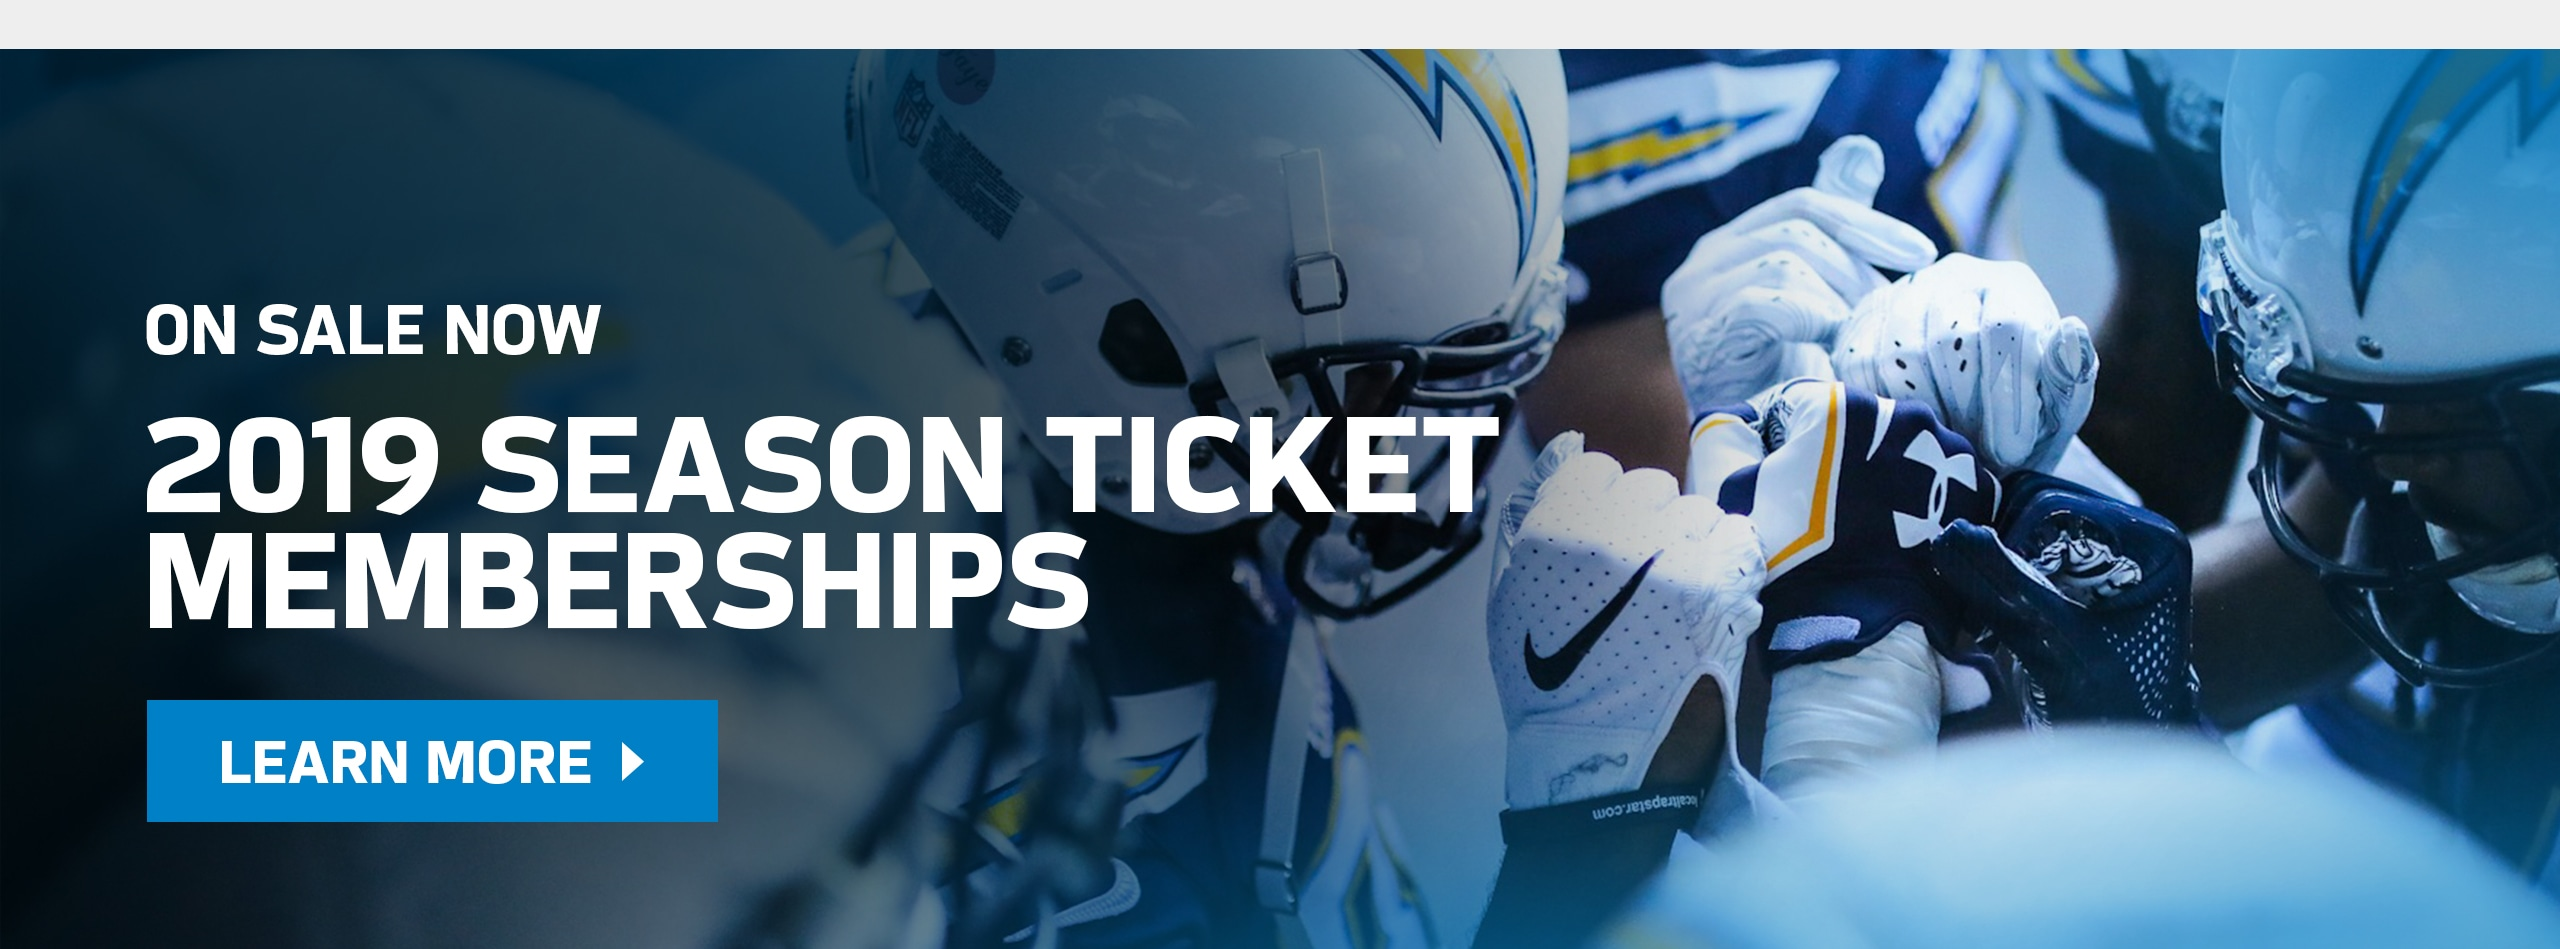 2019 Season Ticket Memberships: Learn More